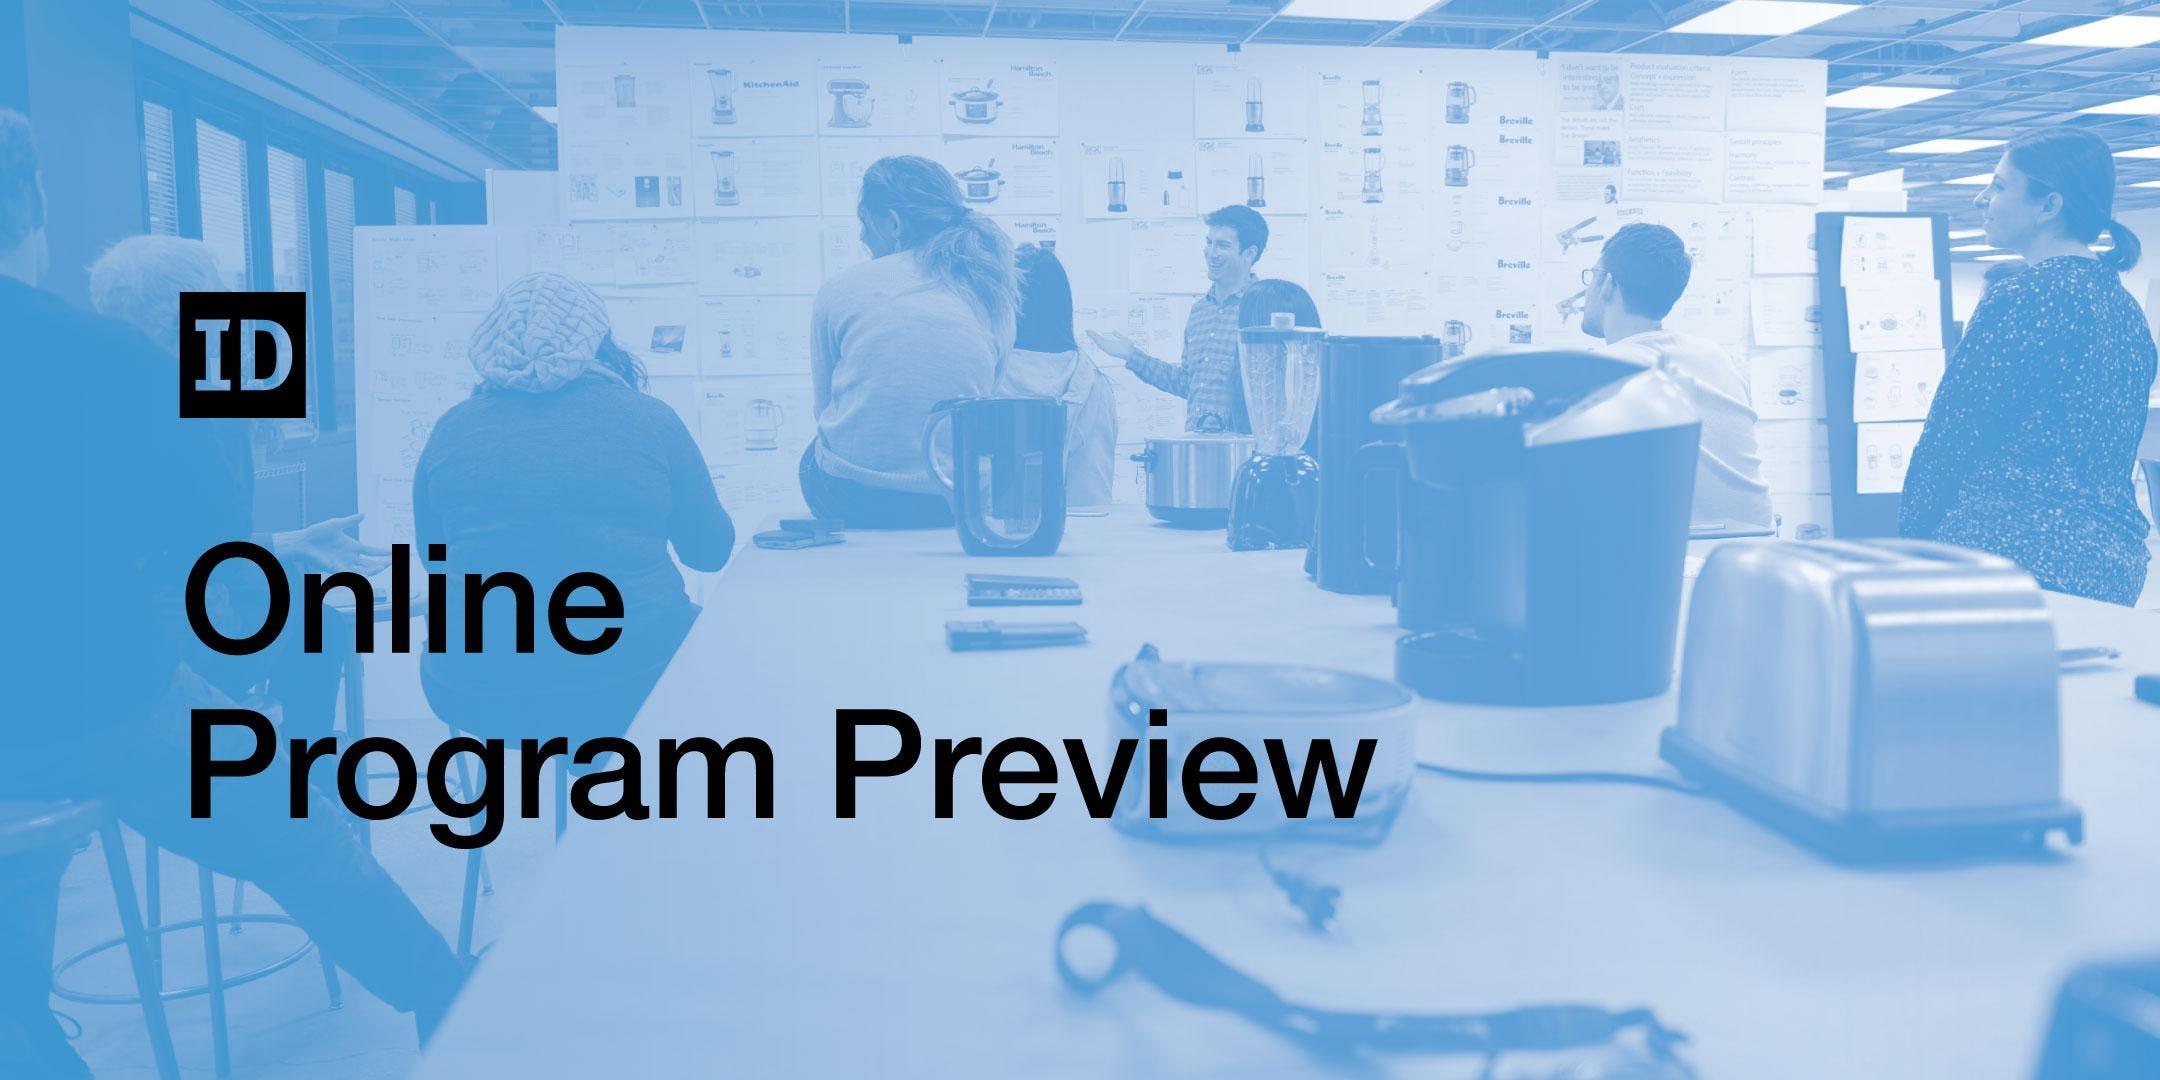 Online IIT Institute of Design Program Preview | April 26